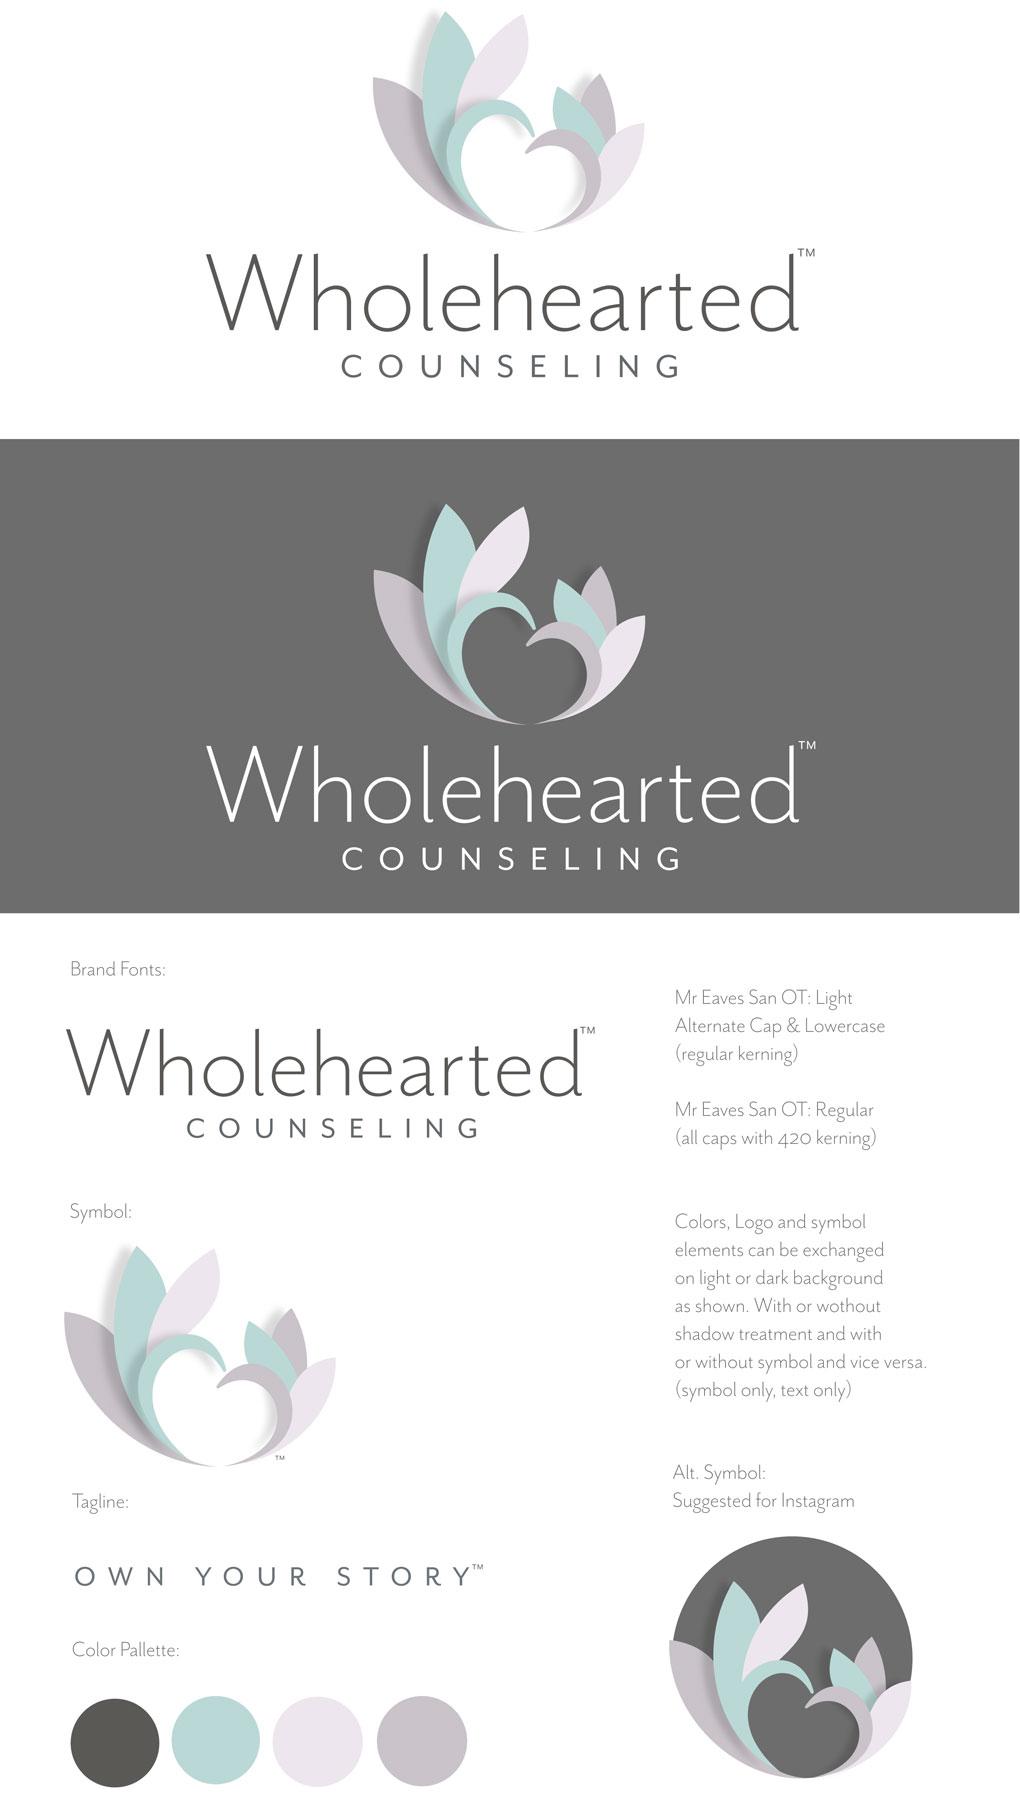 Wholehearted_Brand_web.jpg